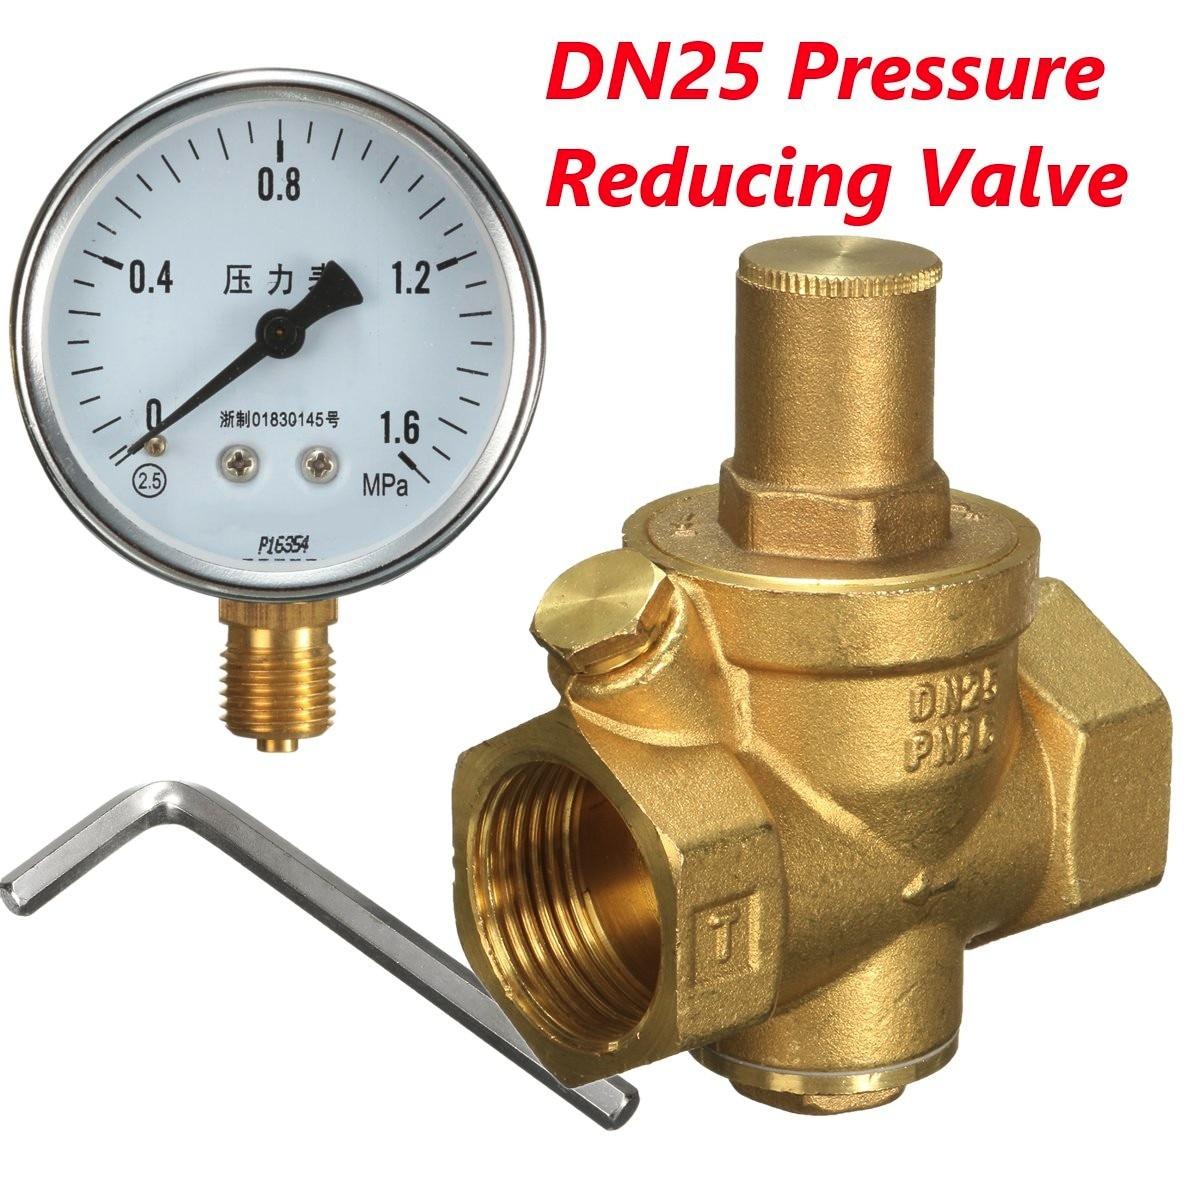 DN25 Brass Water Pressure Regulator with Gauge Water Flow Pressure Maintaining Valve Tap Water Pressure Reducing Valve